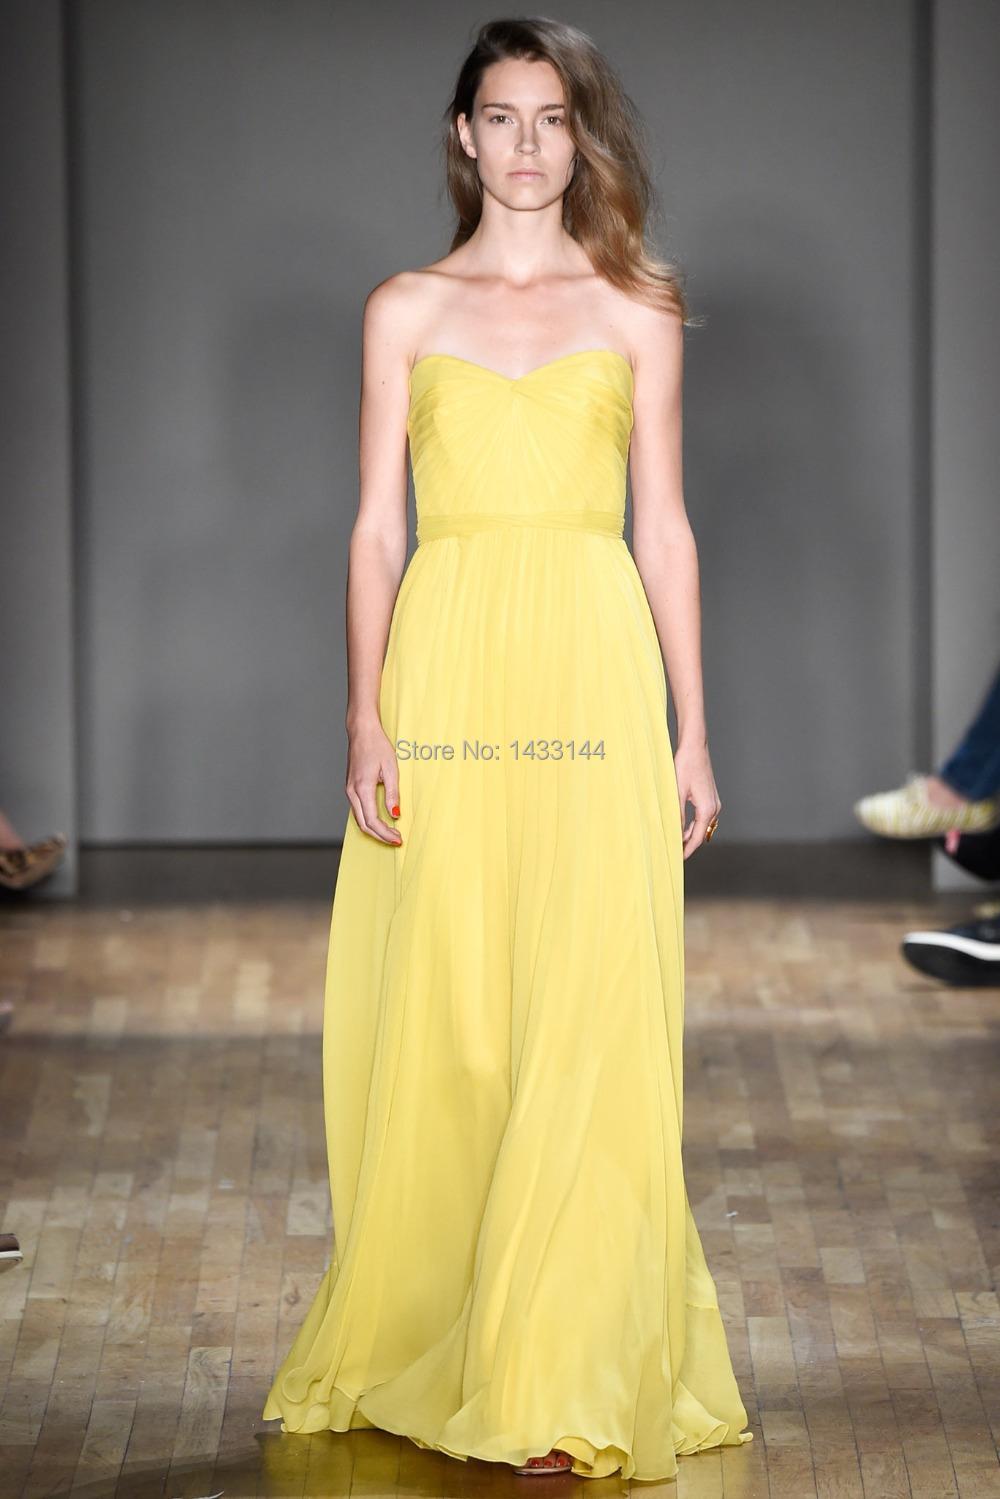 Long Yellow Bridesmaid Dresses Packham 2015 Bright Colored